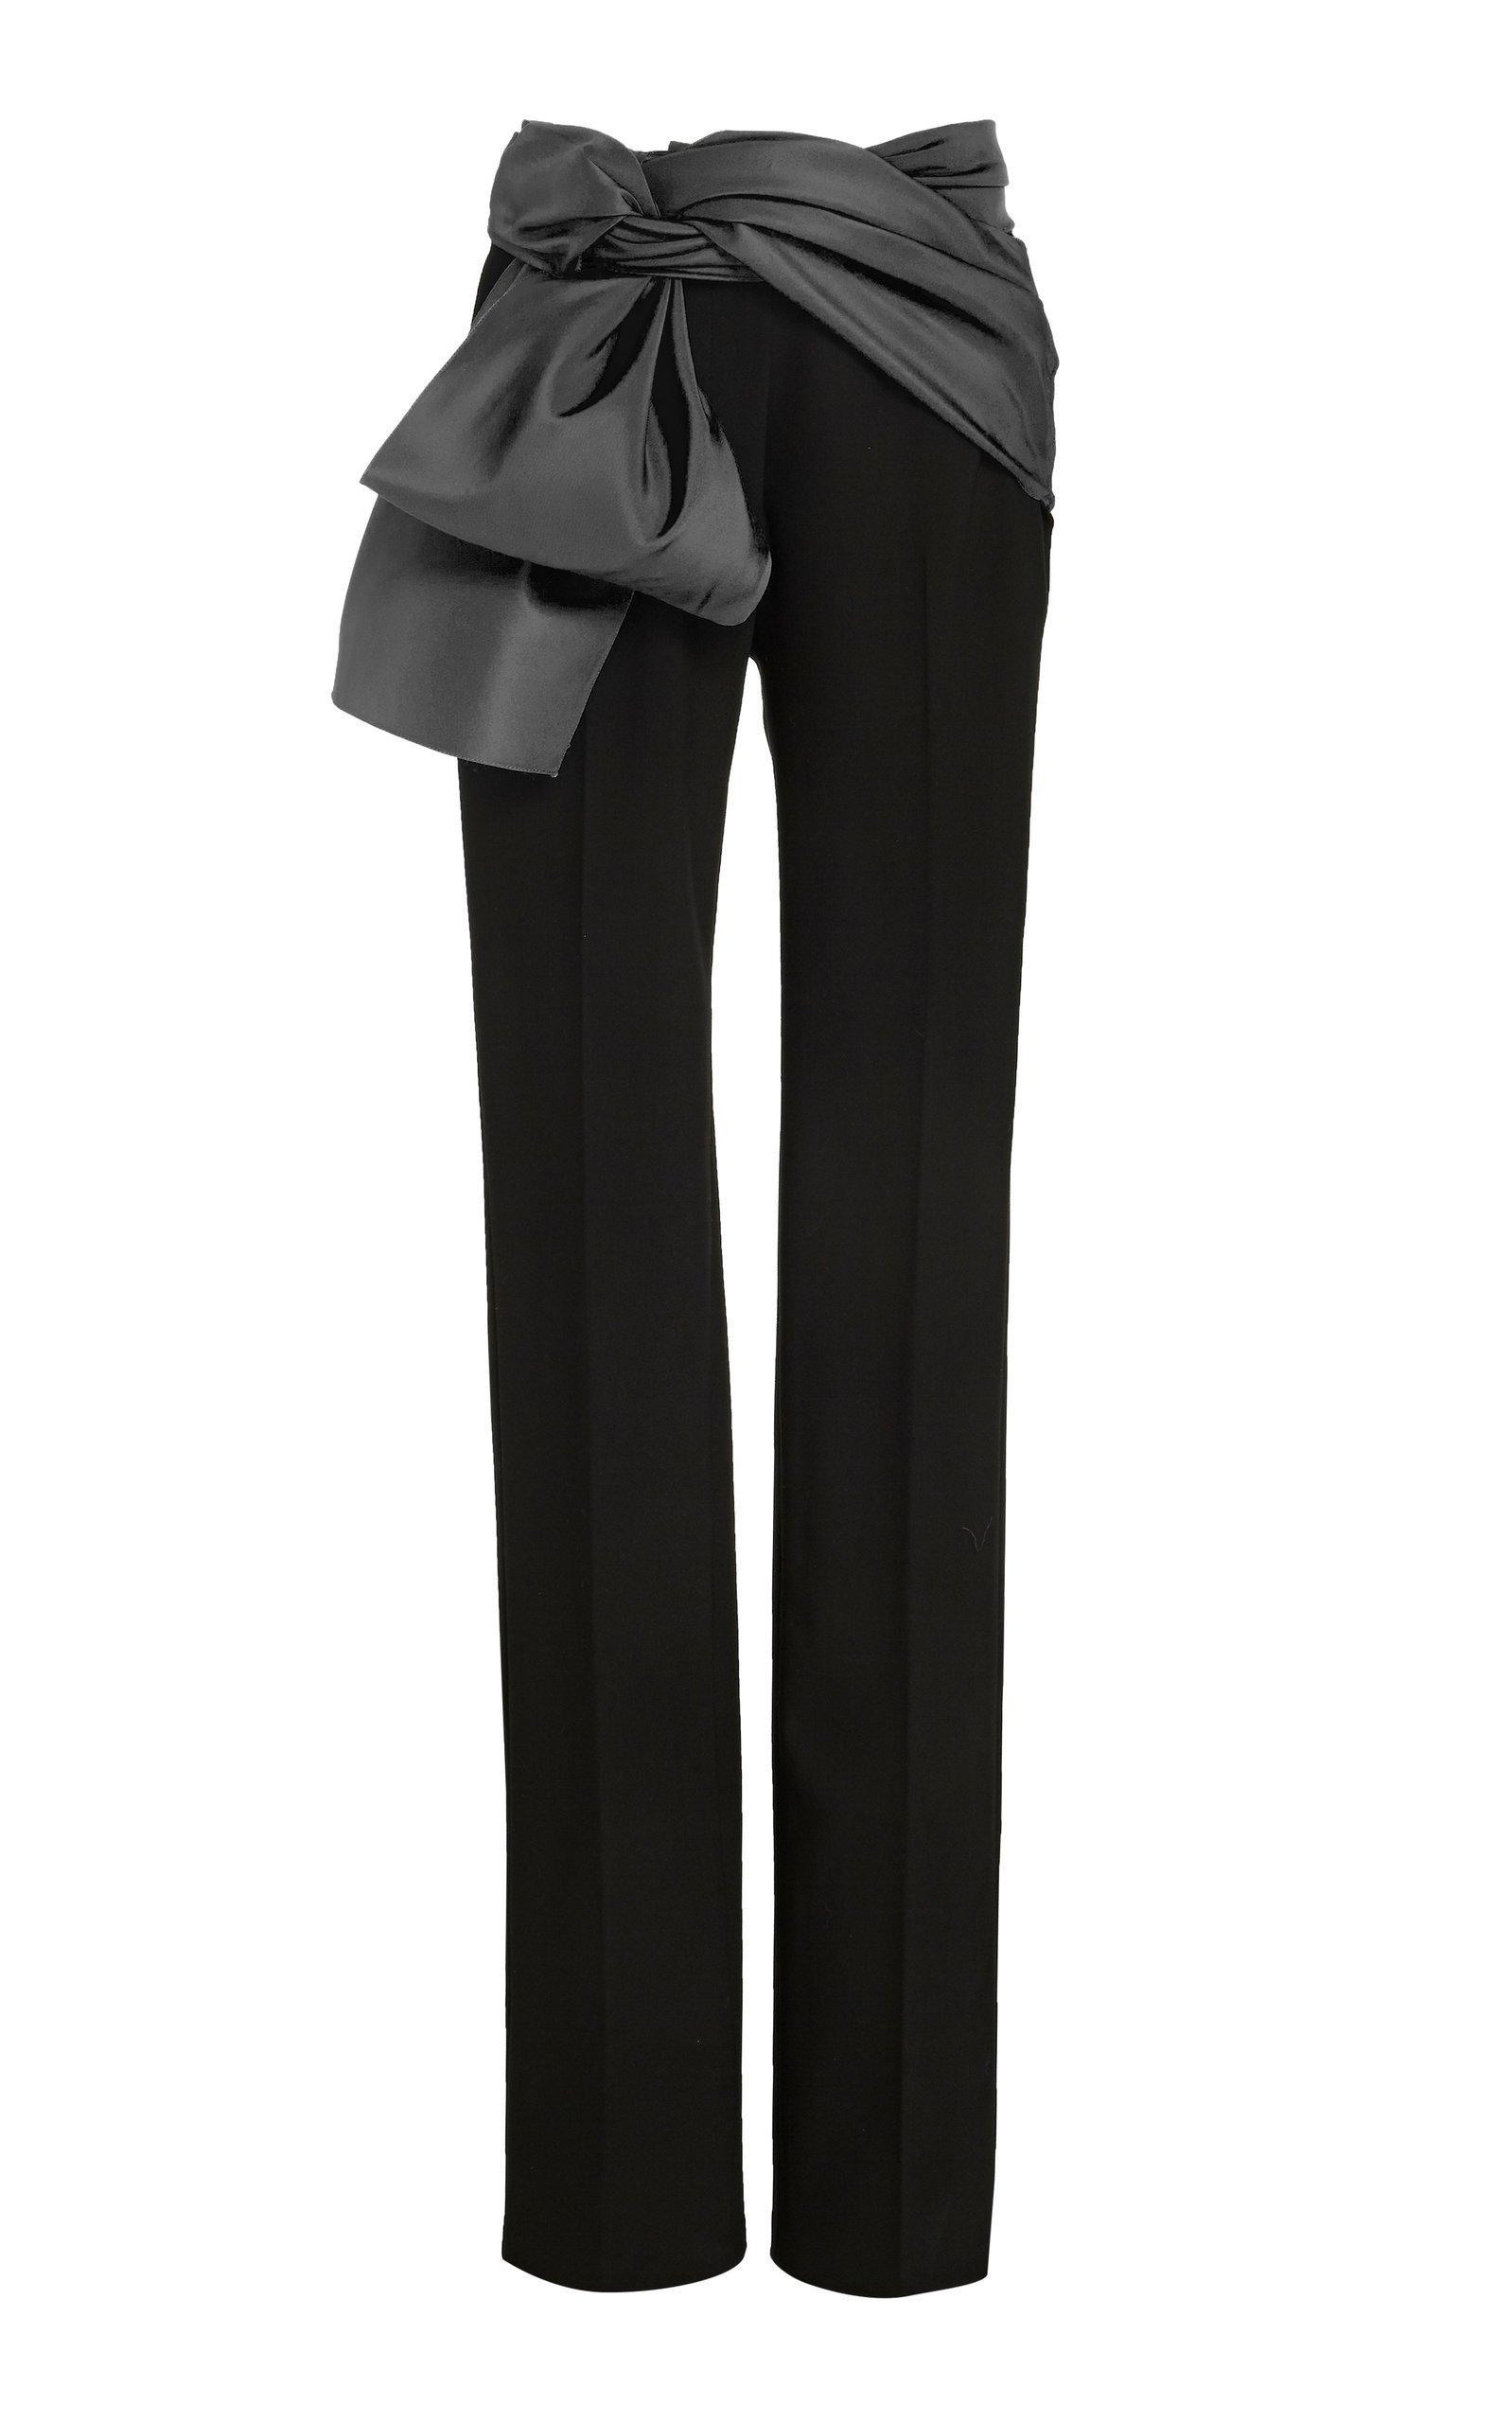 Carolina Herrera Satin-Trimmed Crepe Straight-Leg Pants Size: 2